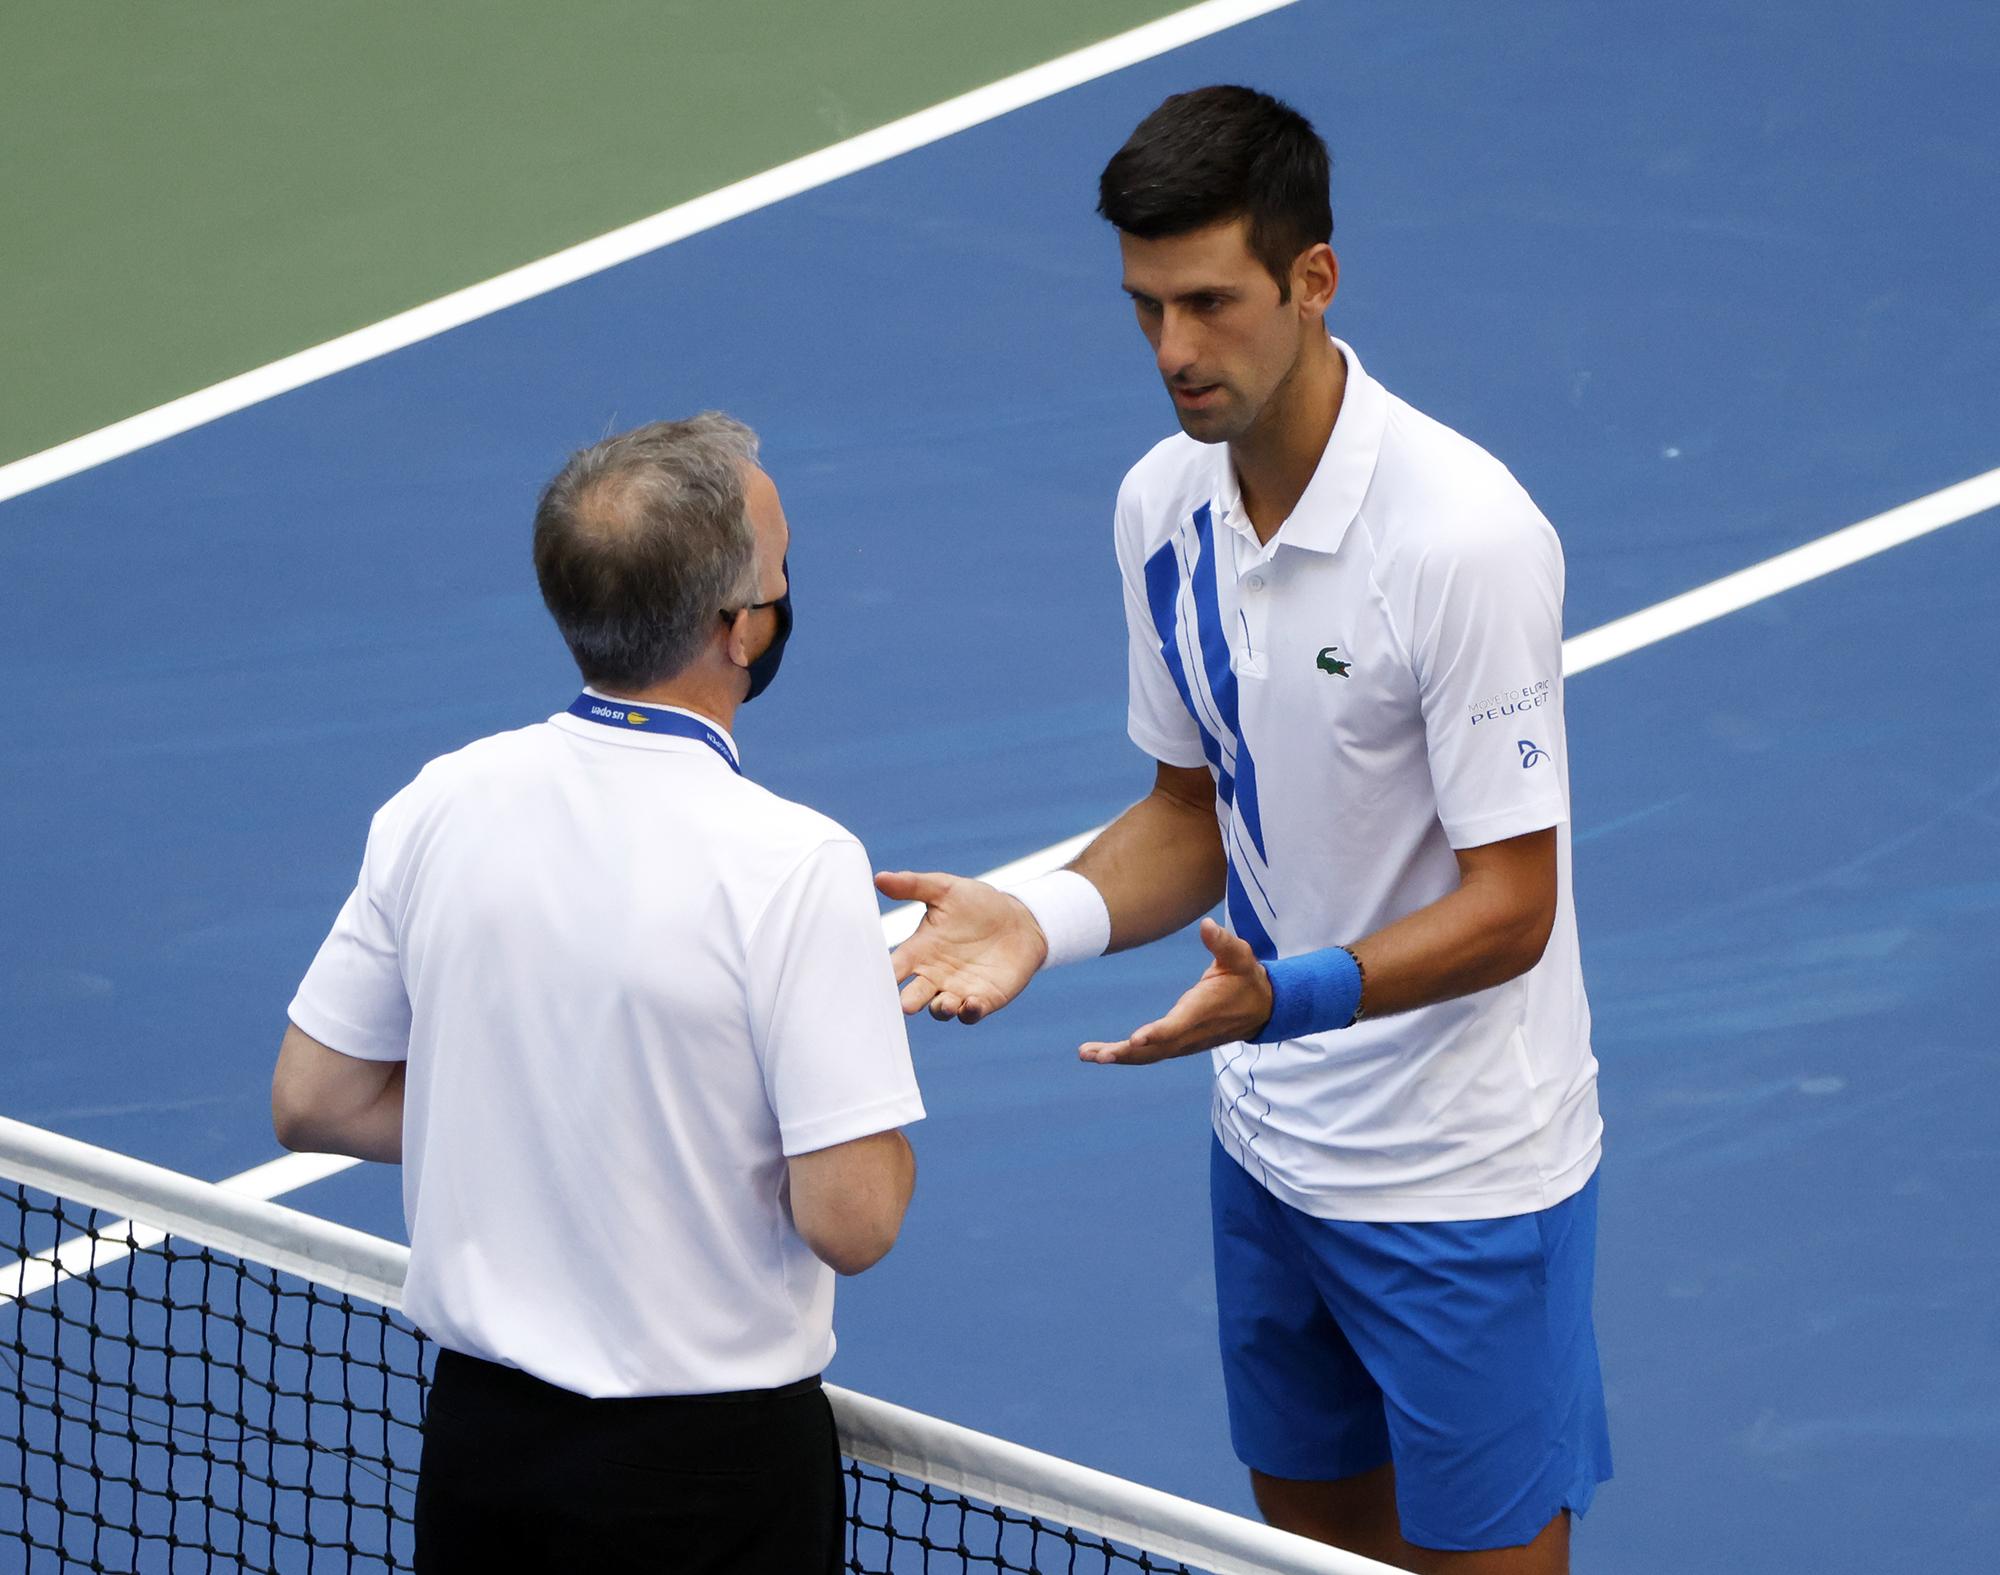 Novak Djokovic Act Of Petulance Turns Genius Into A Vi